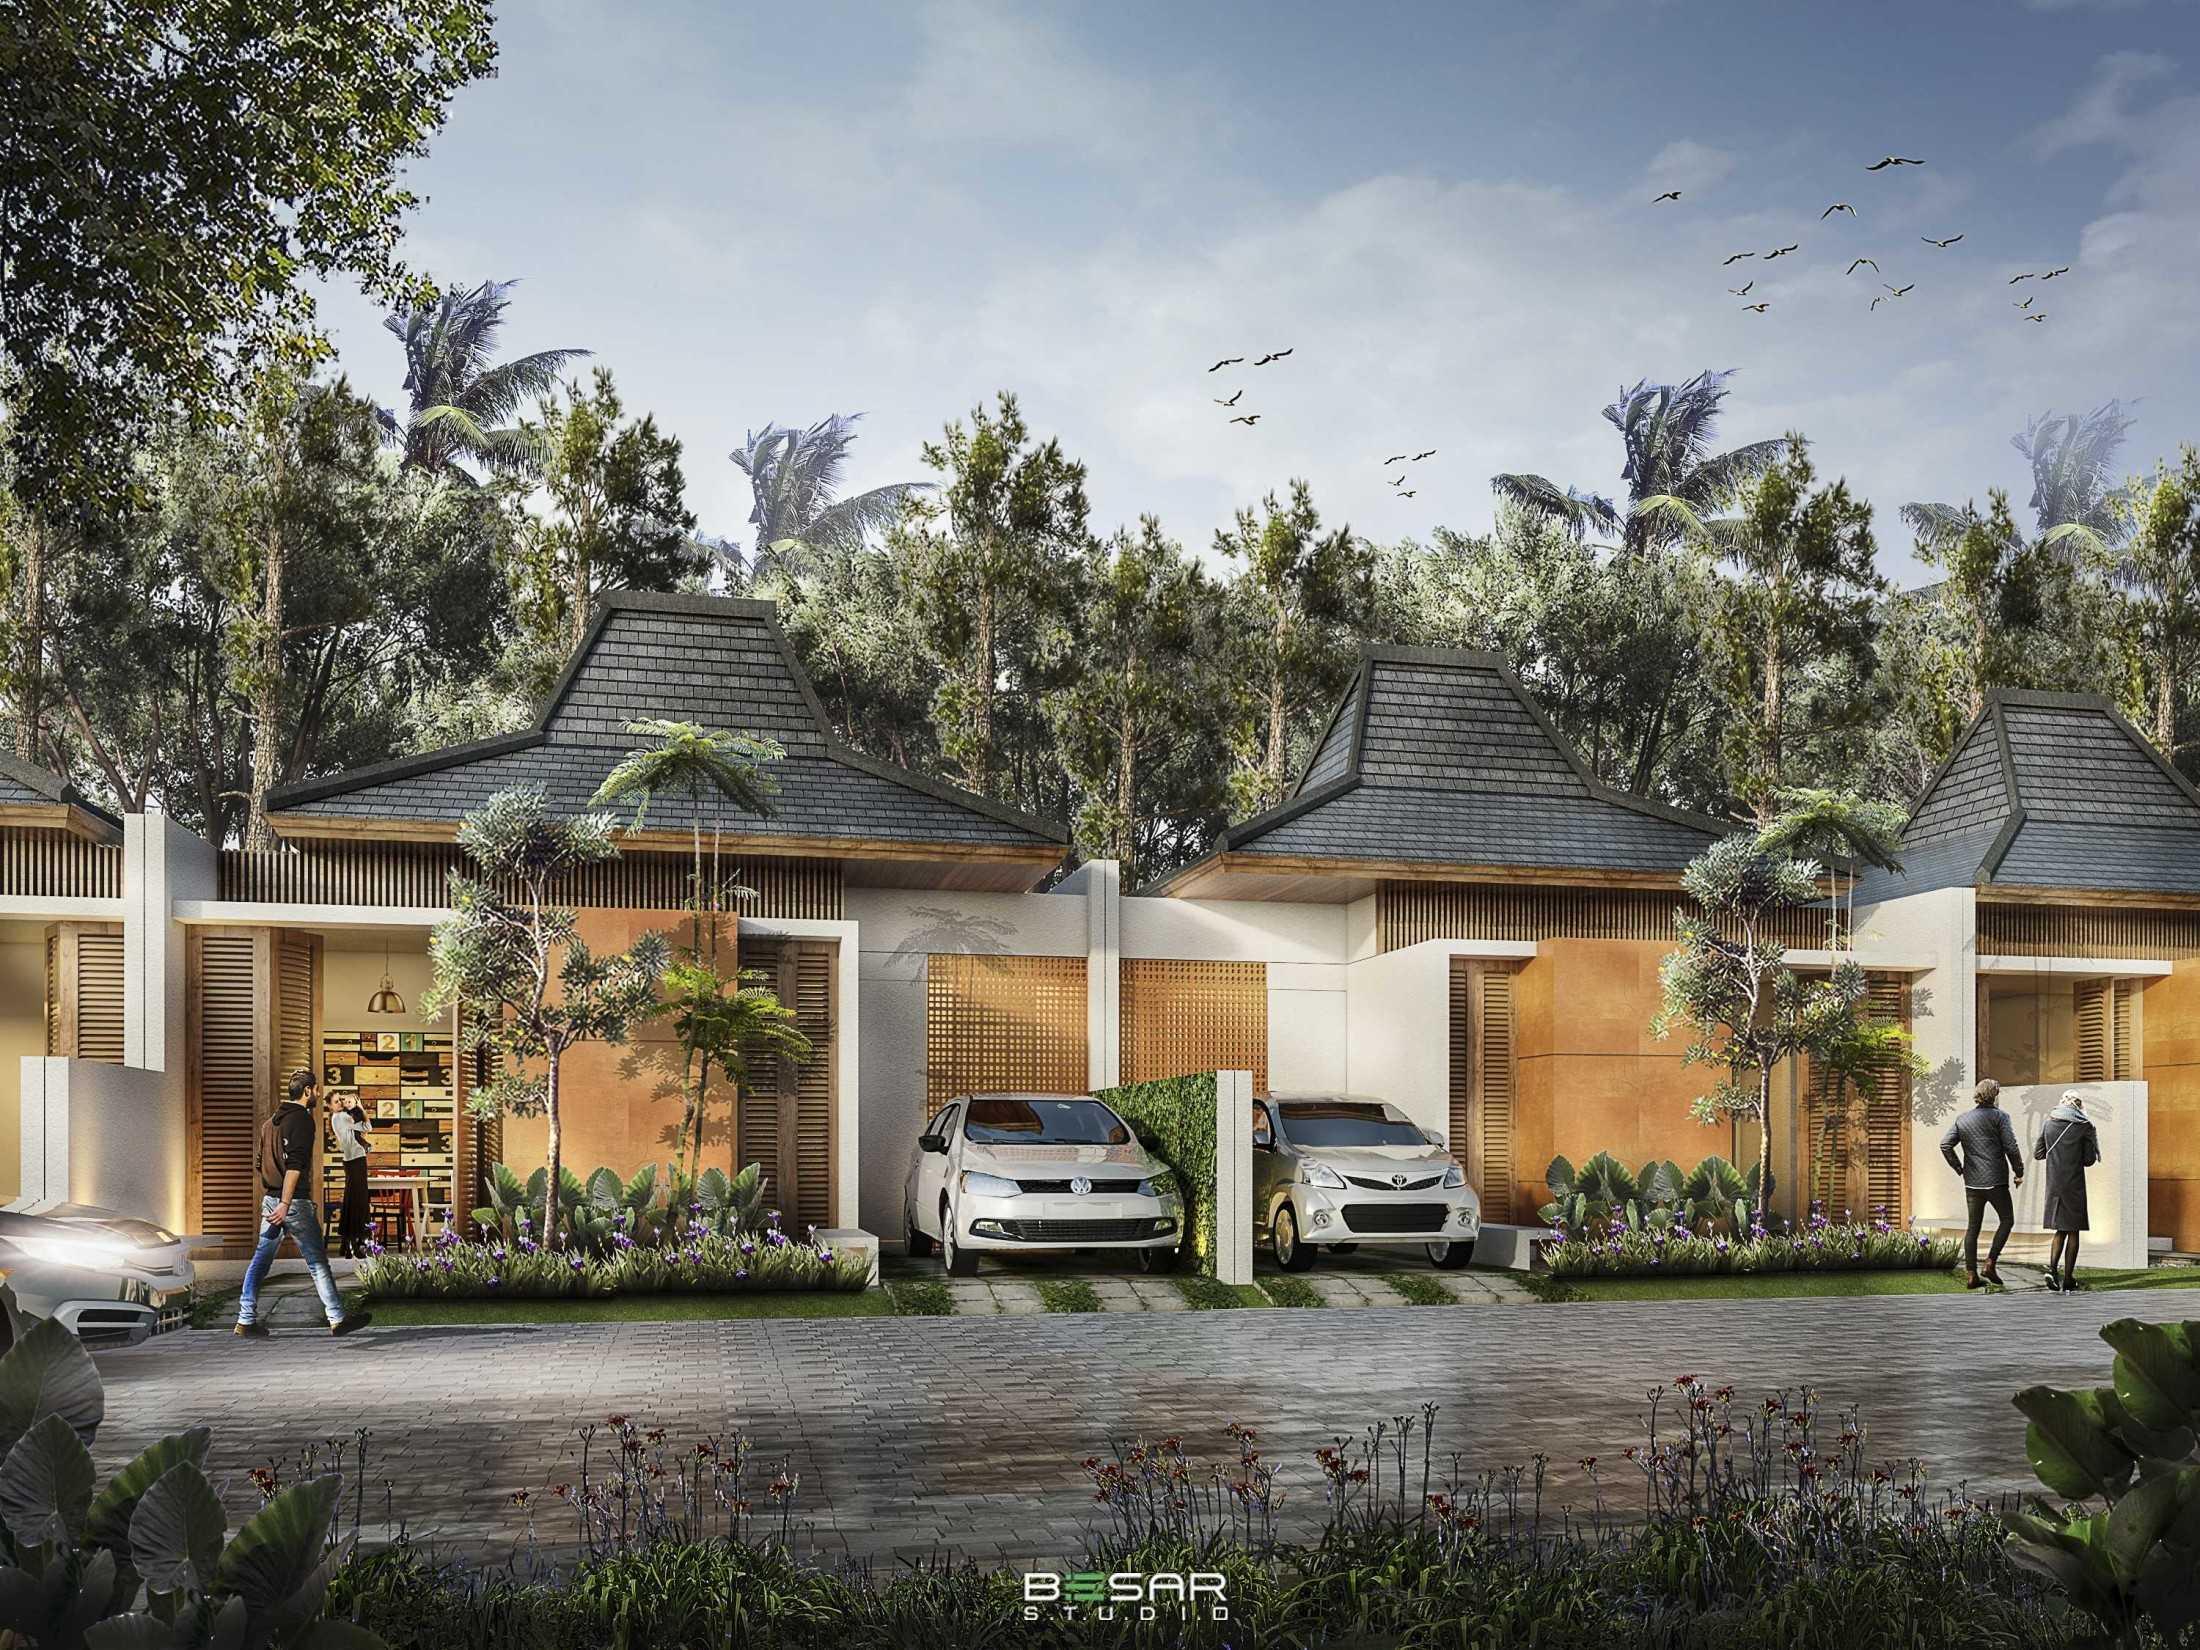 Studio Besar Premium Joglo House Jakarta, Daerah Khusus Ibukota Jakarta, Indonesia Jakarta, Daerah Khusus Ibukota Jakarta, Indonesia Studio-Besar-Premium-Joglo-House  61921